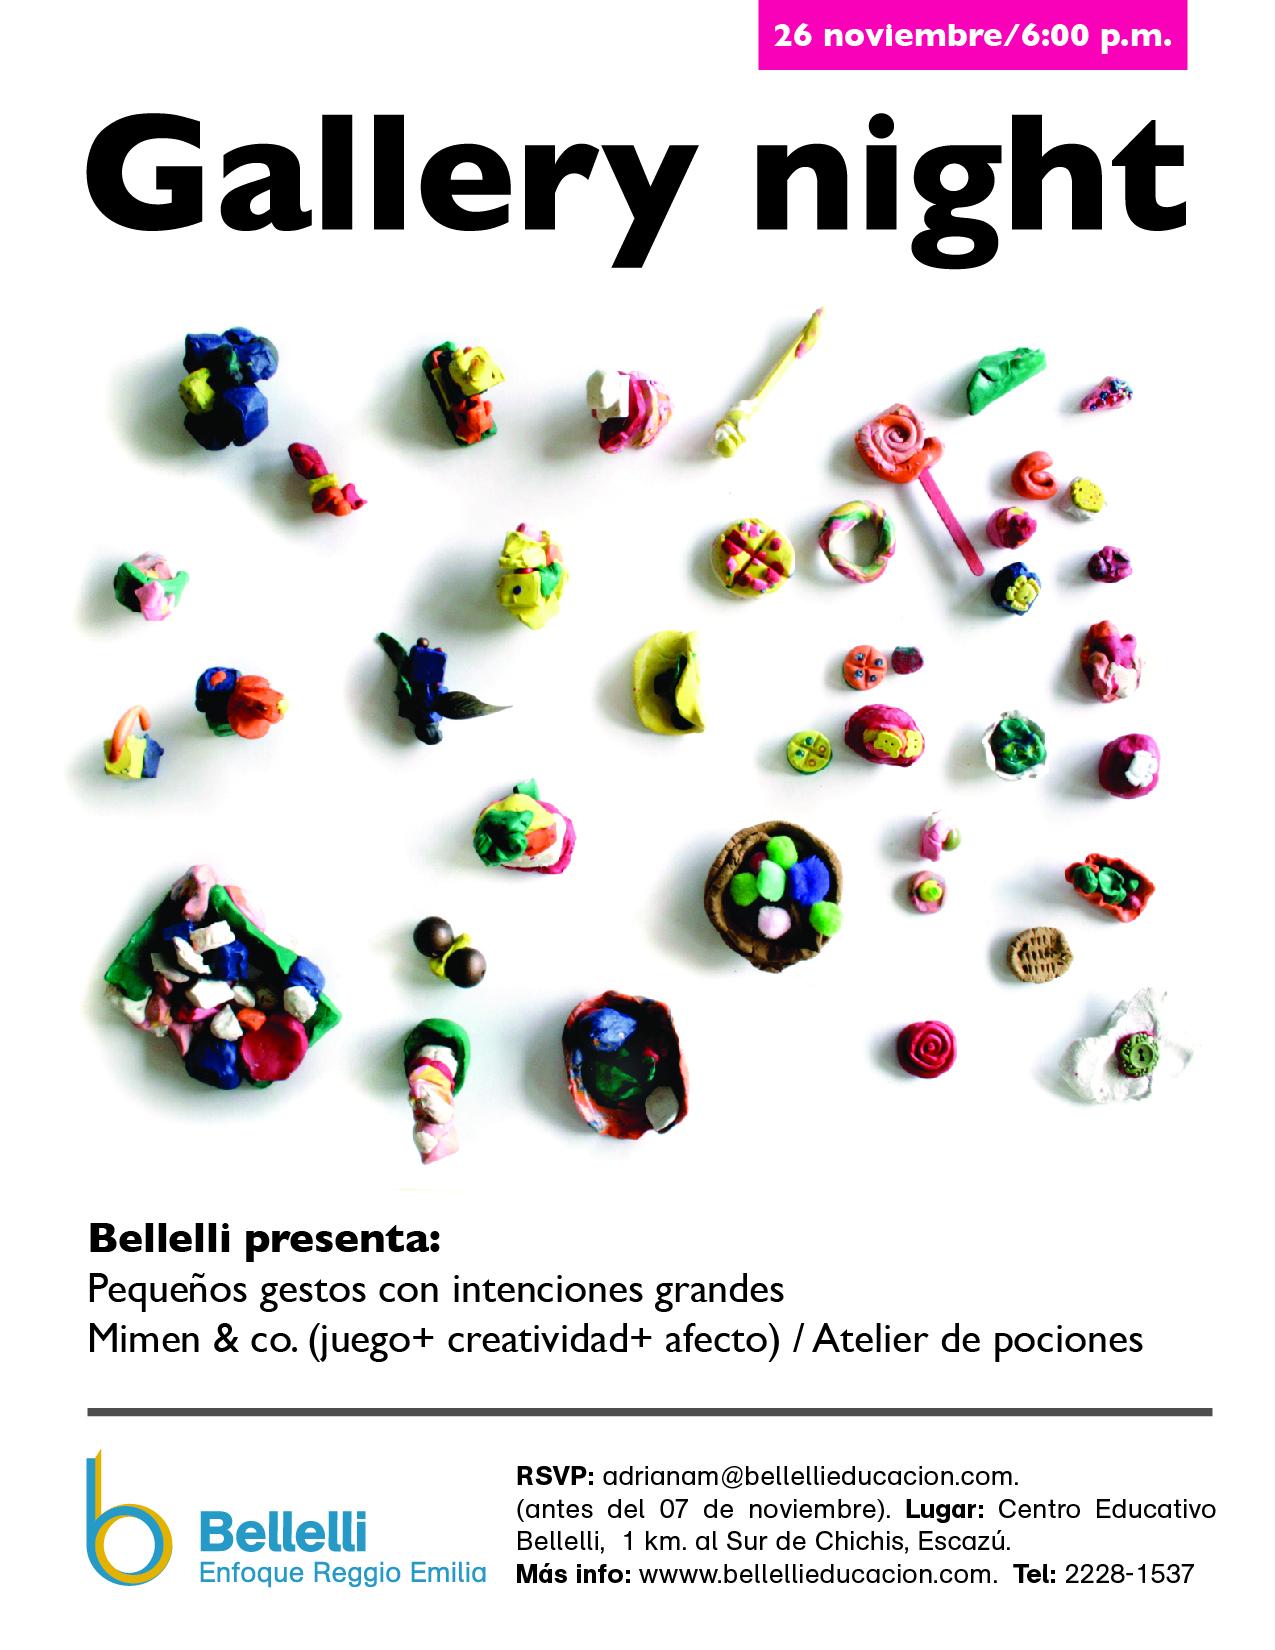 gallerynight-01.jpg